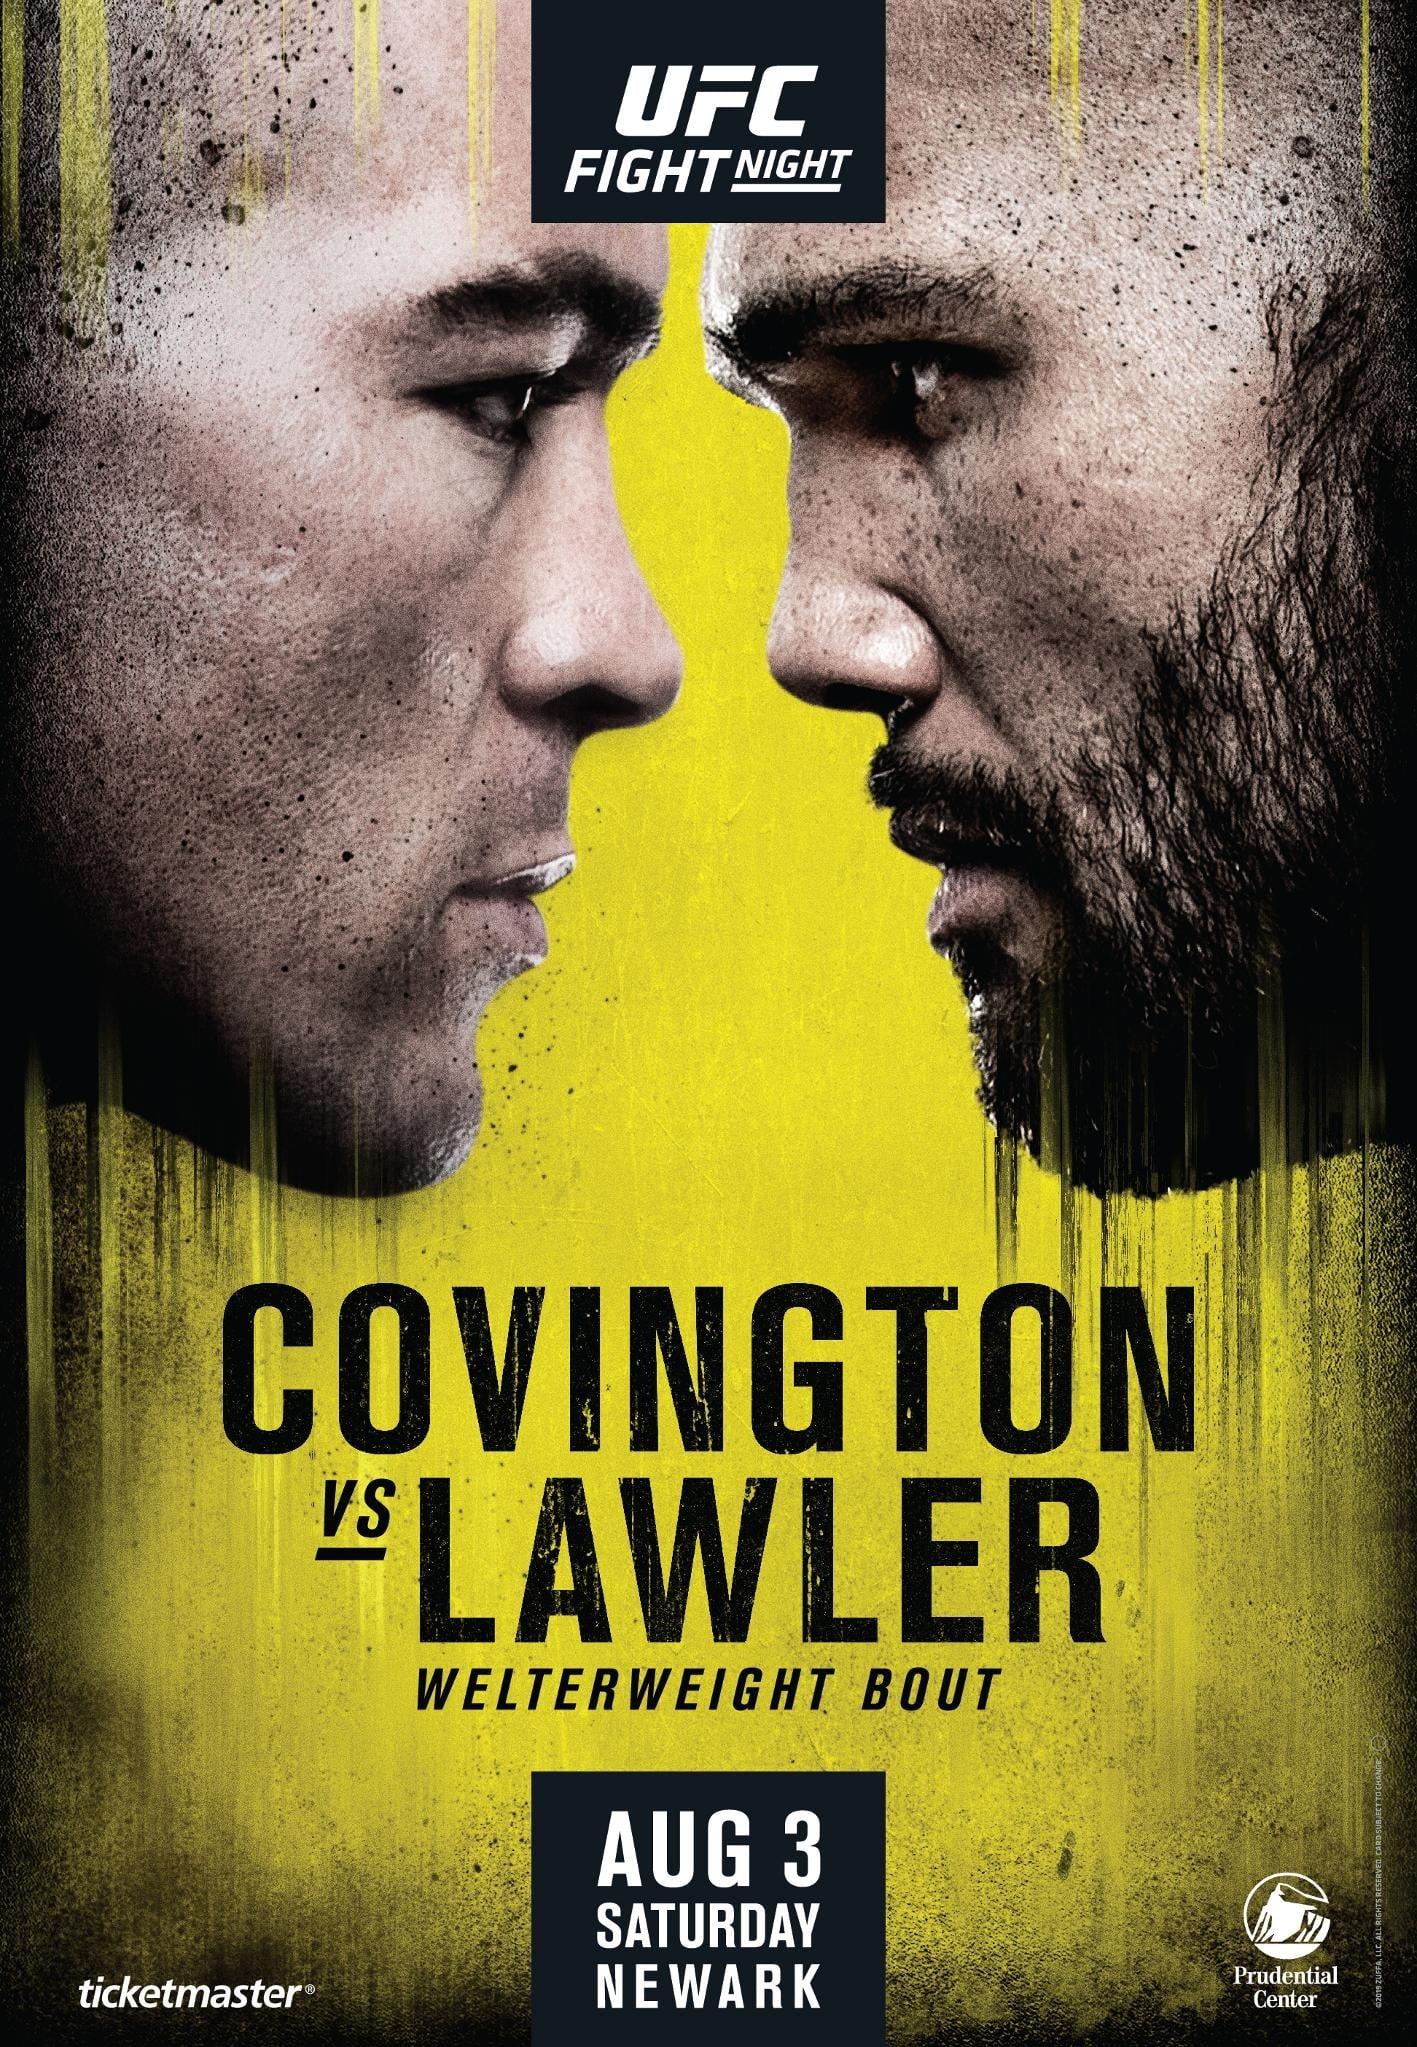 UFC on ESPN 5: Covington vs. Lawler